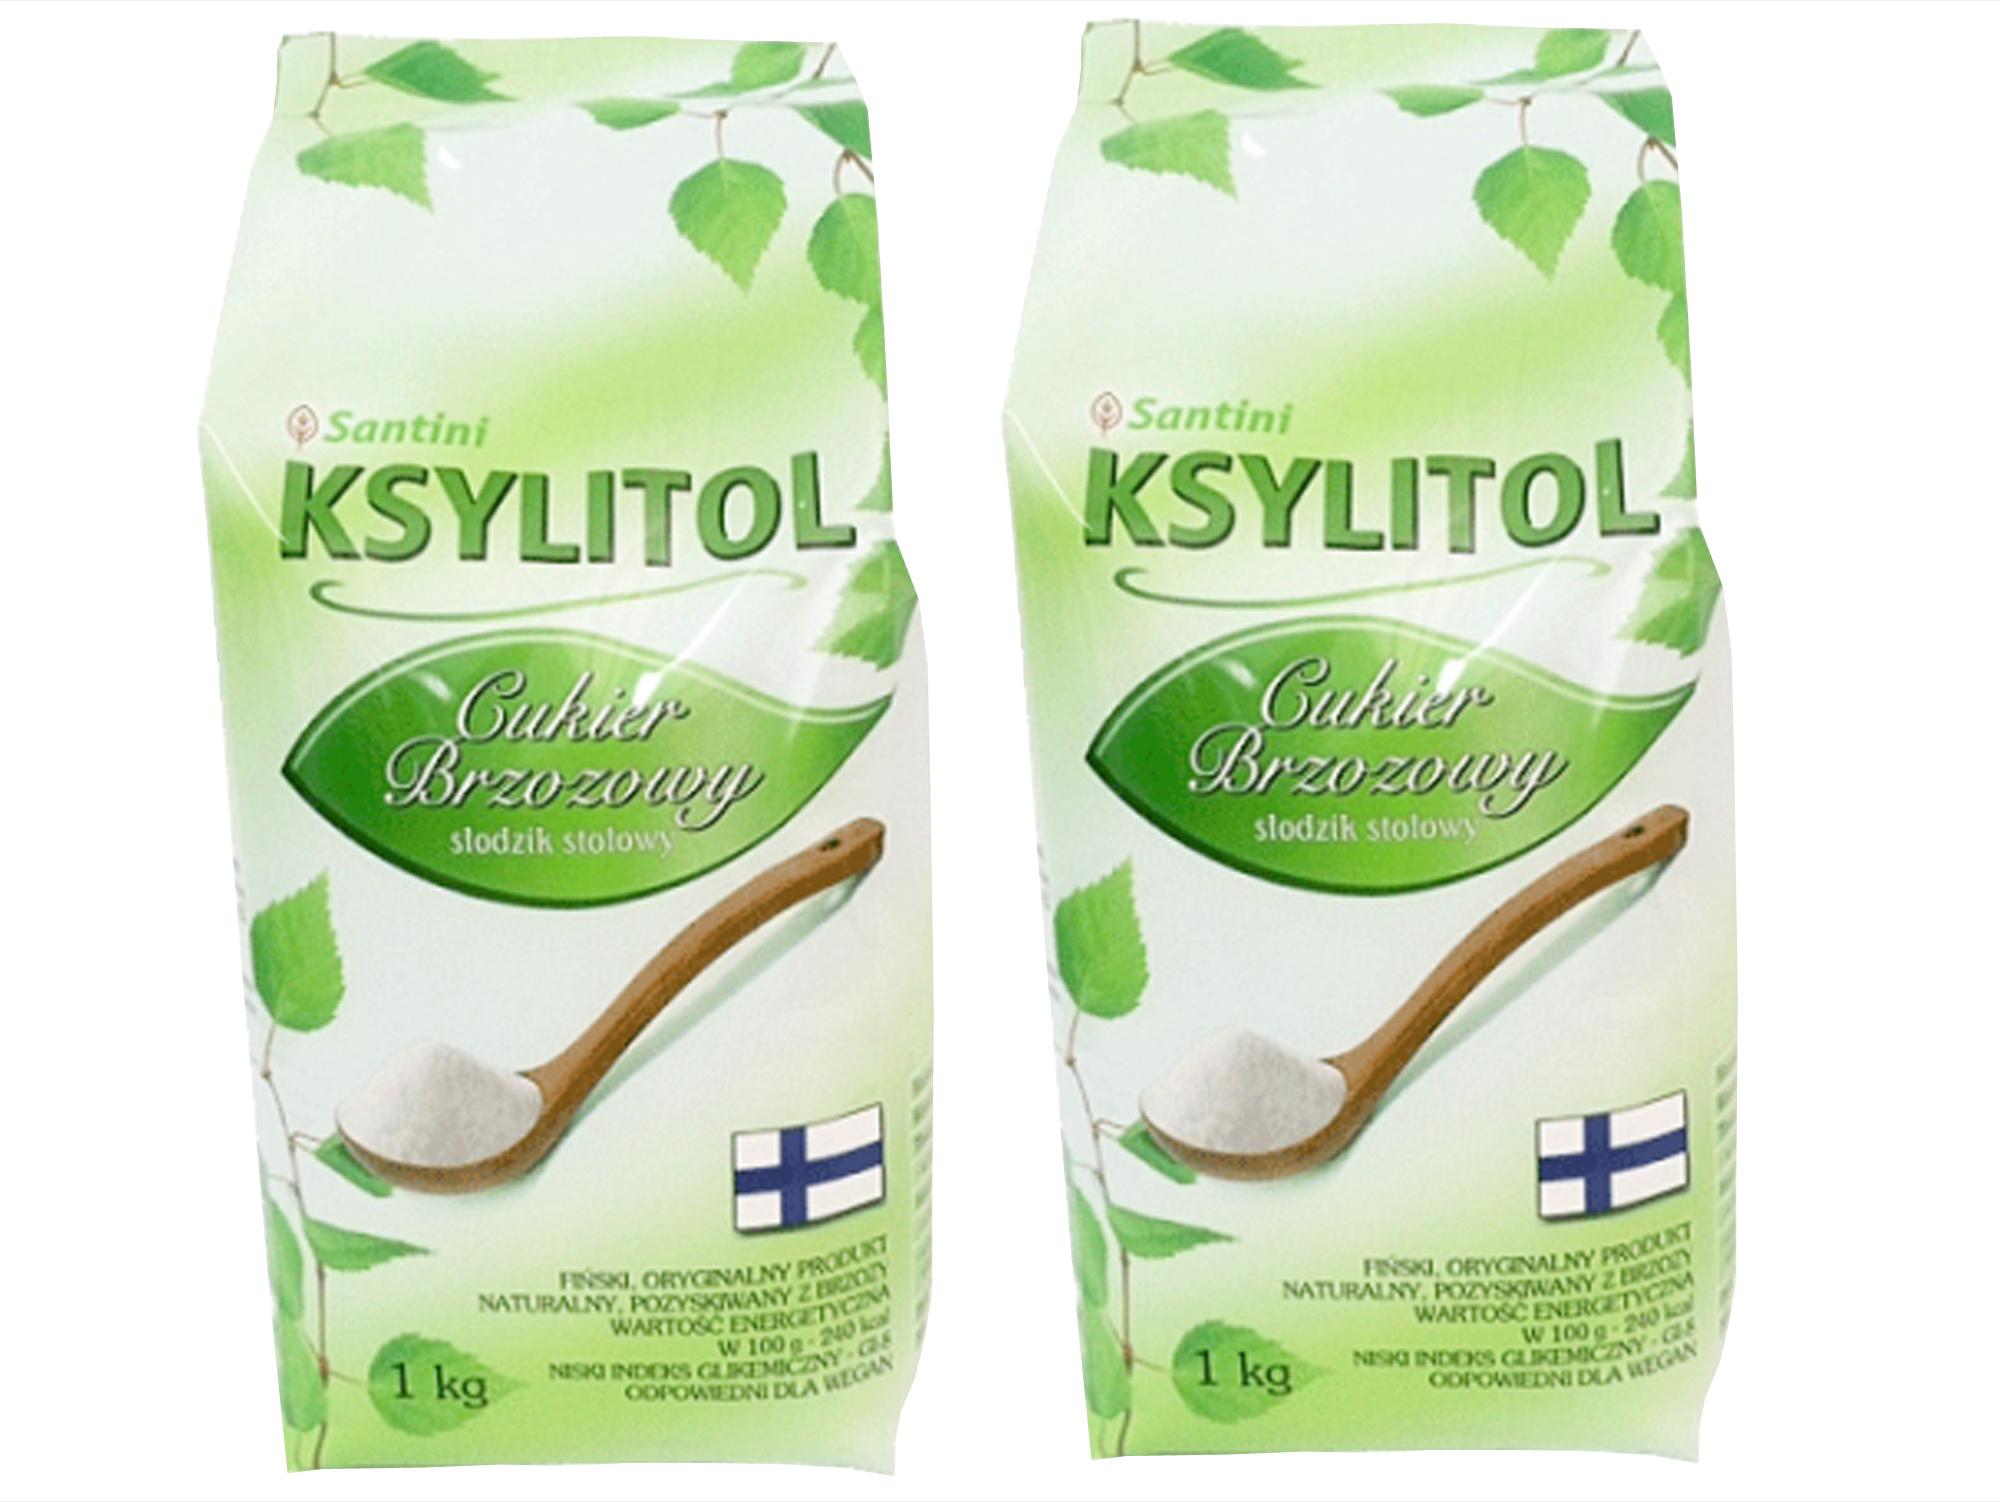 XYLITOL 2 kg fínsky 100% breza cukru, ekonomika